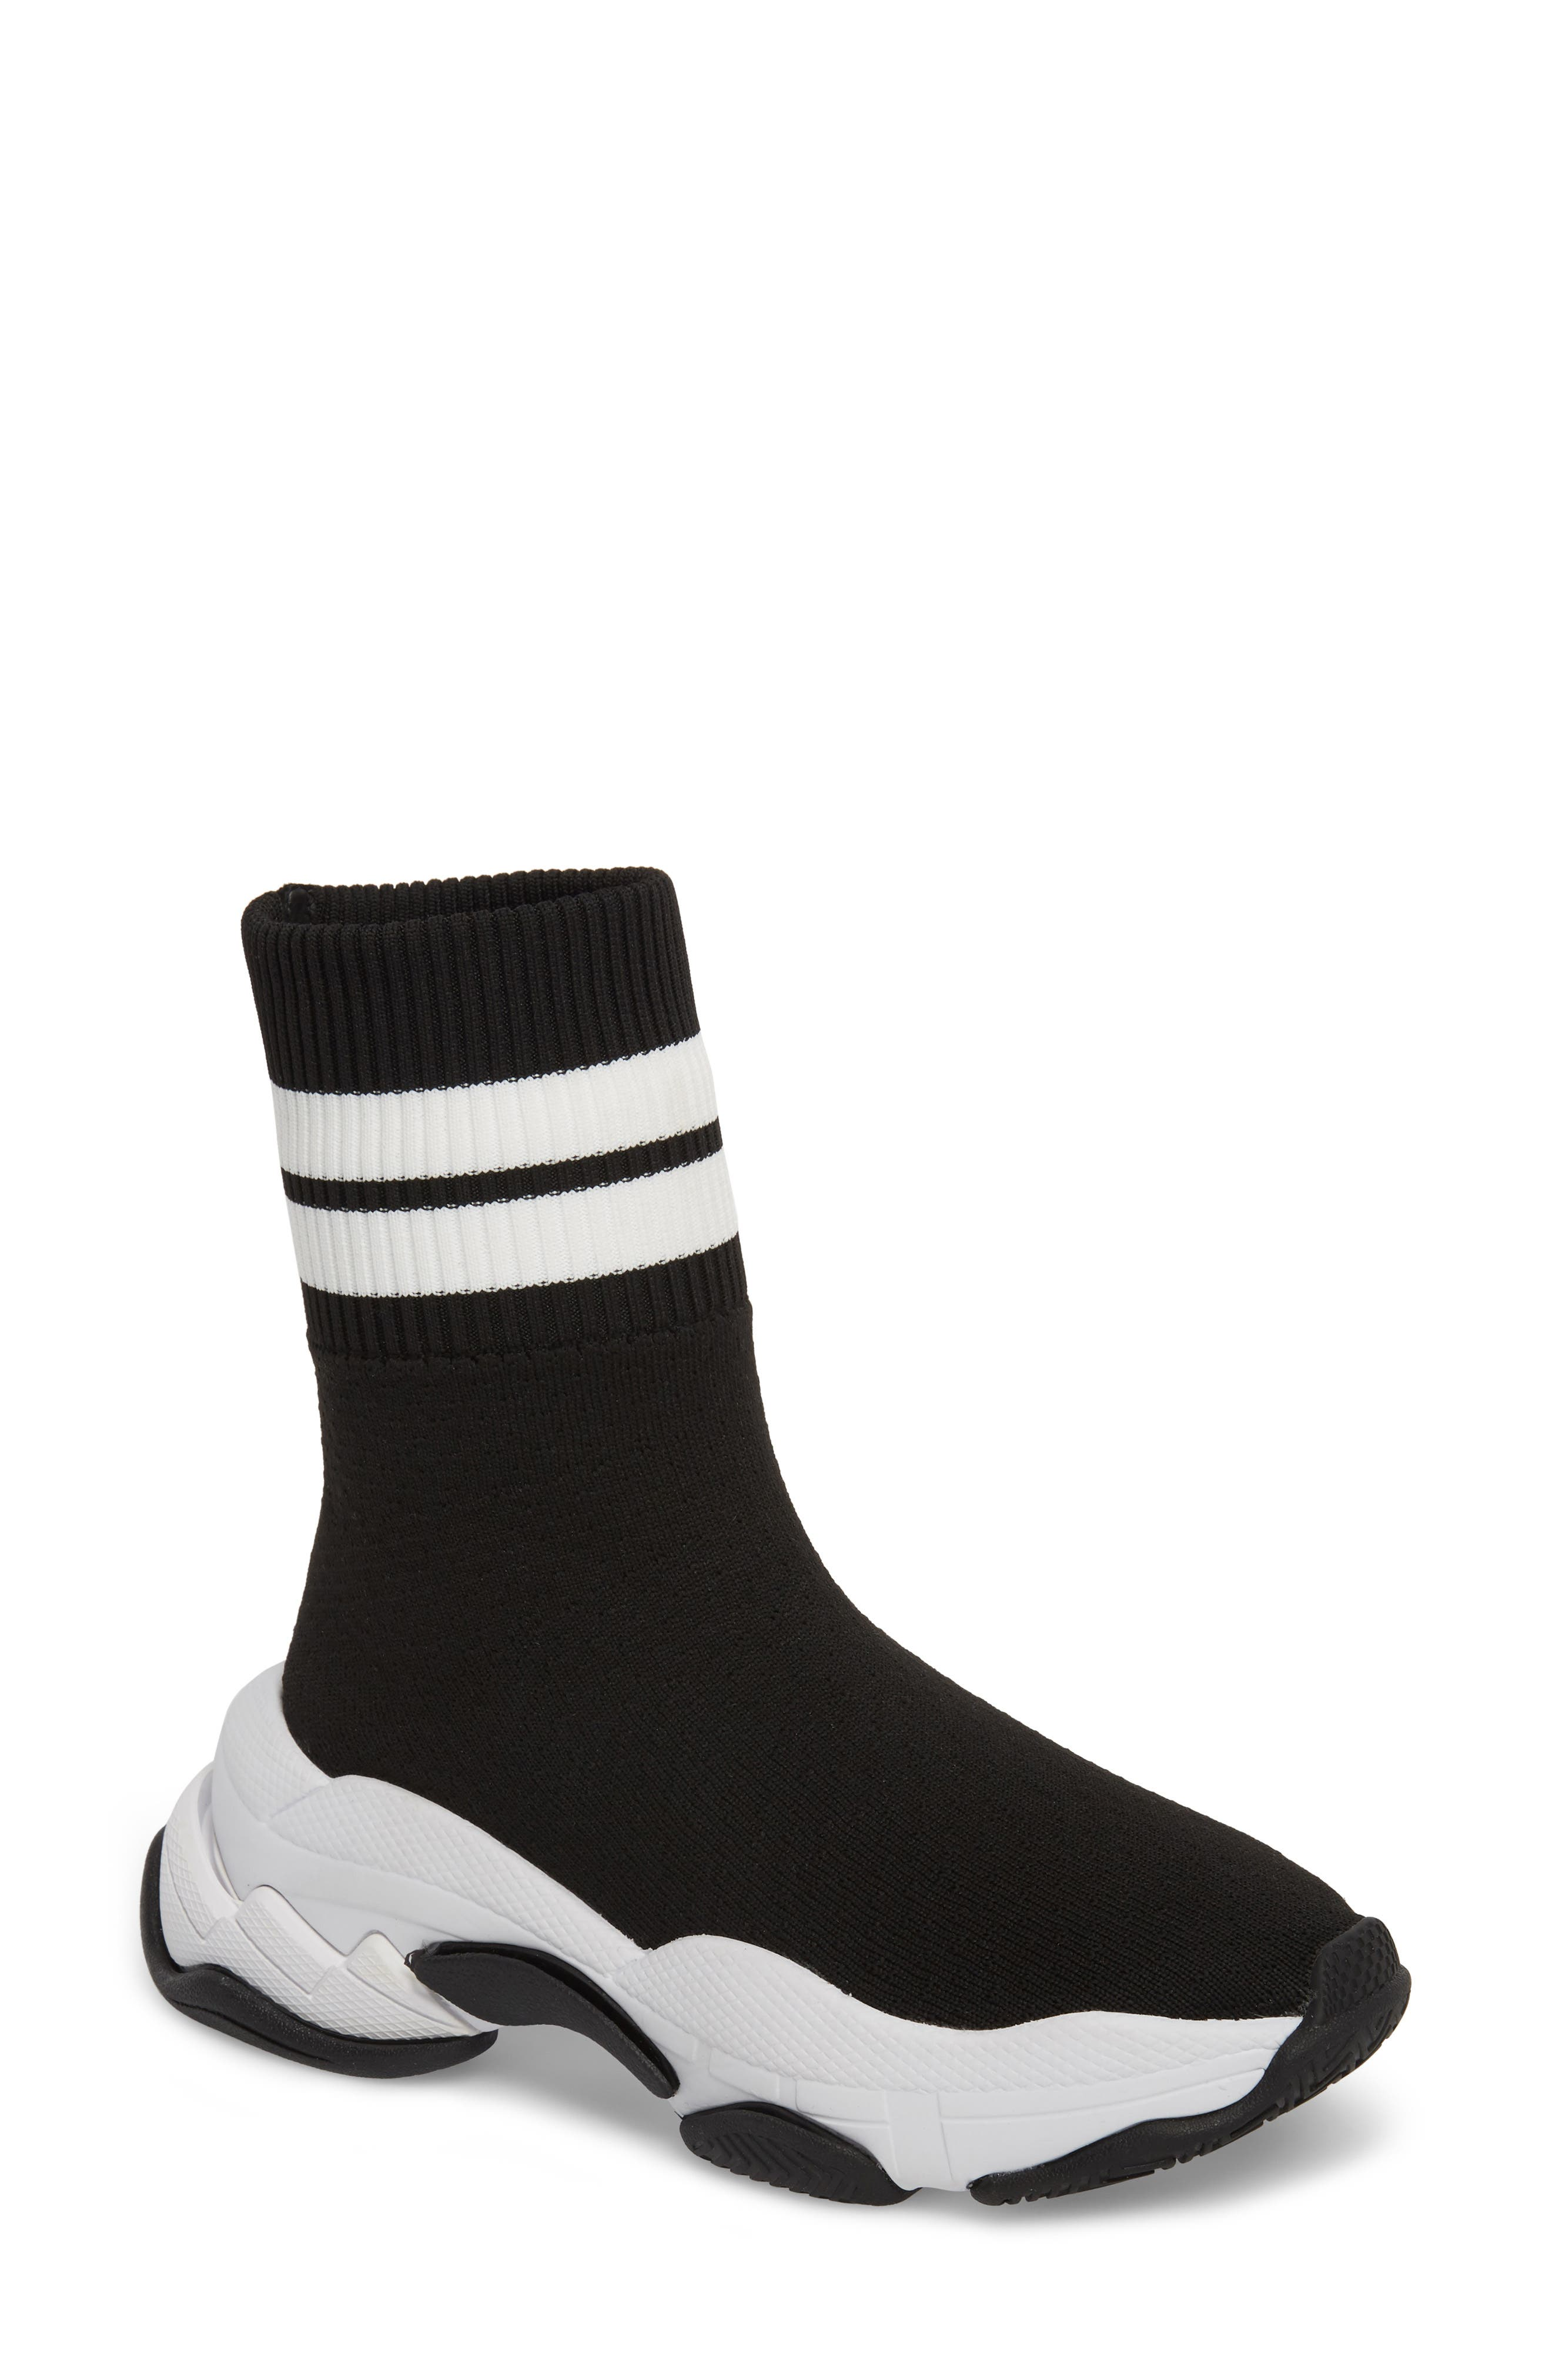 Tenko Ankle High Top Sock Sneaker,                         Main,                         color, Black/ White Stripe Fabric